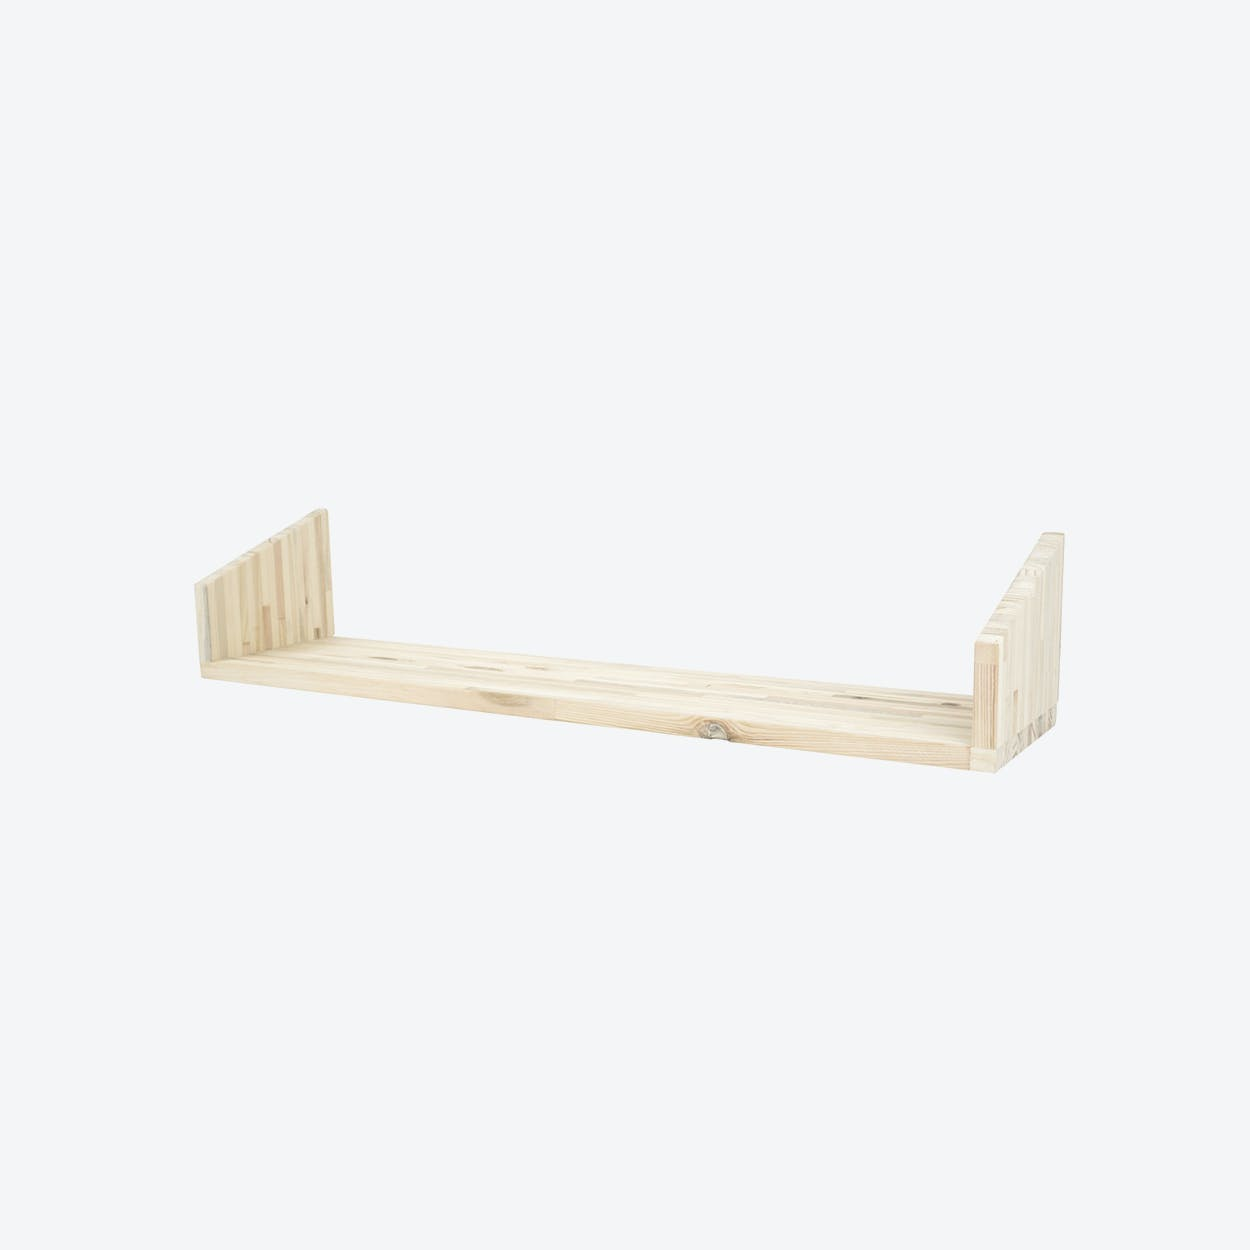 Fency Shelves, Pressed Pallet, Quatro